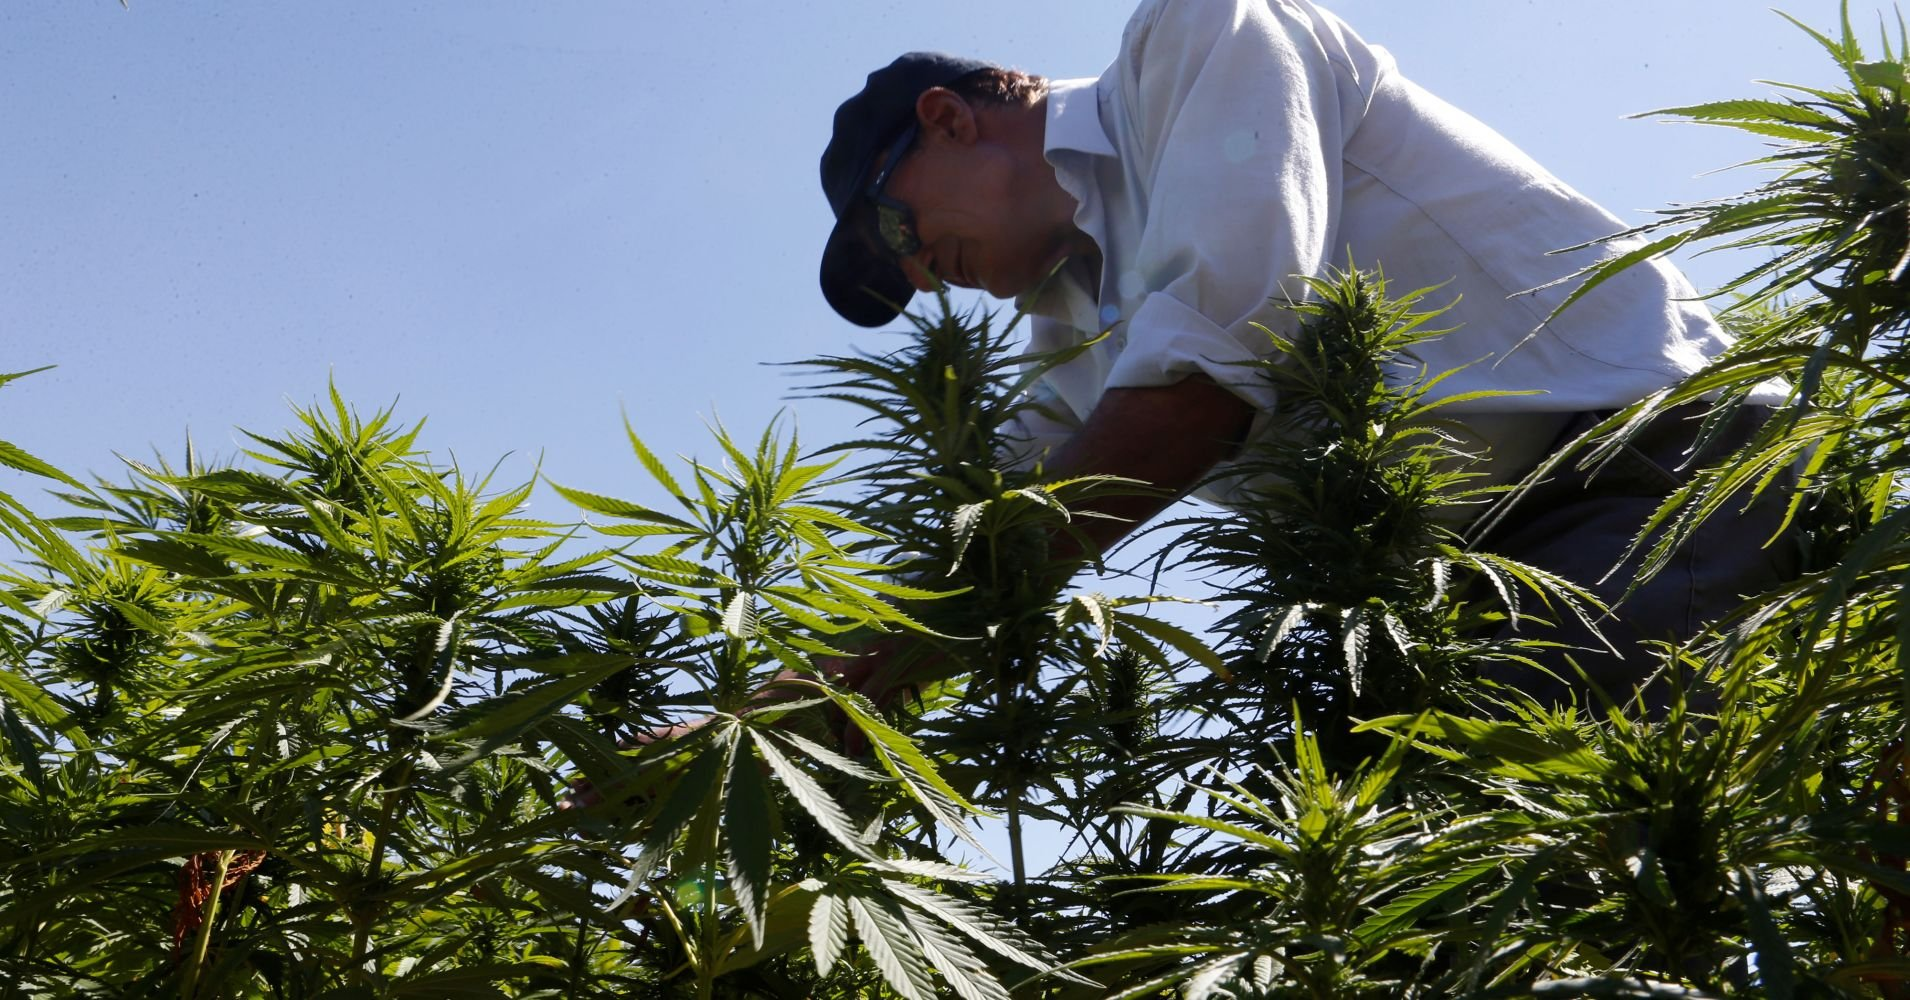 It's inevitable that marijuana will be decriminalized the US, says CEO of $43 billion alcohol company